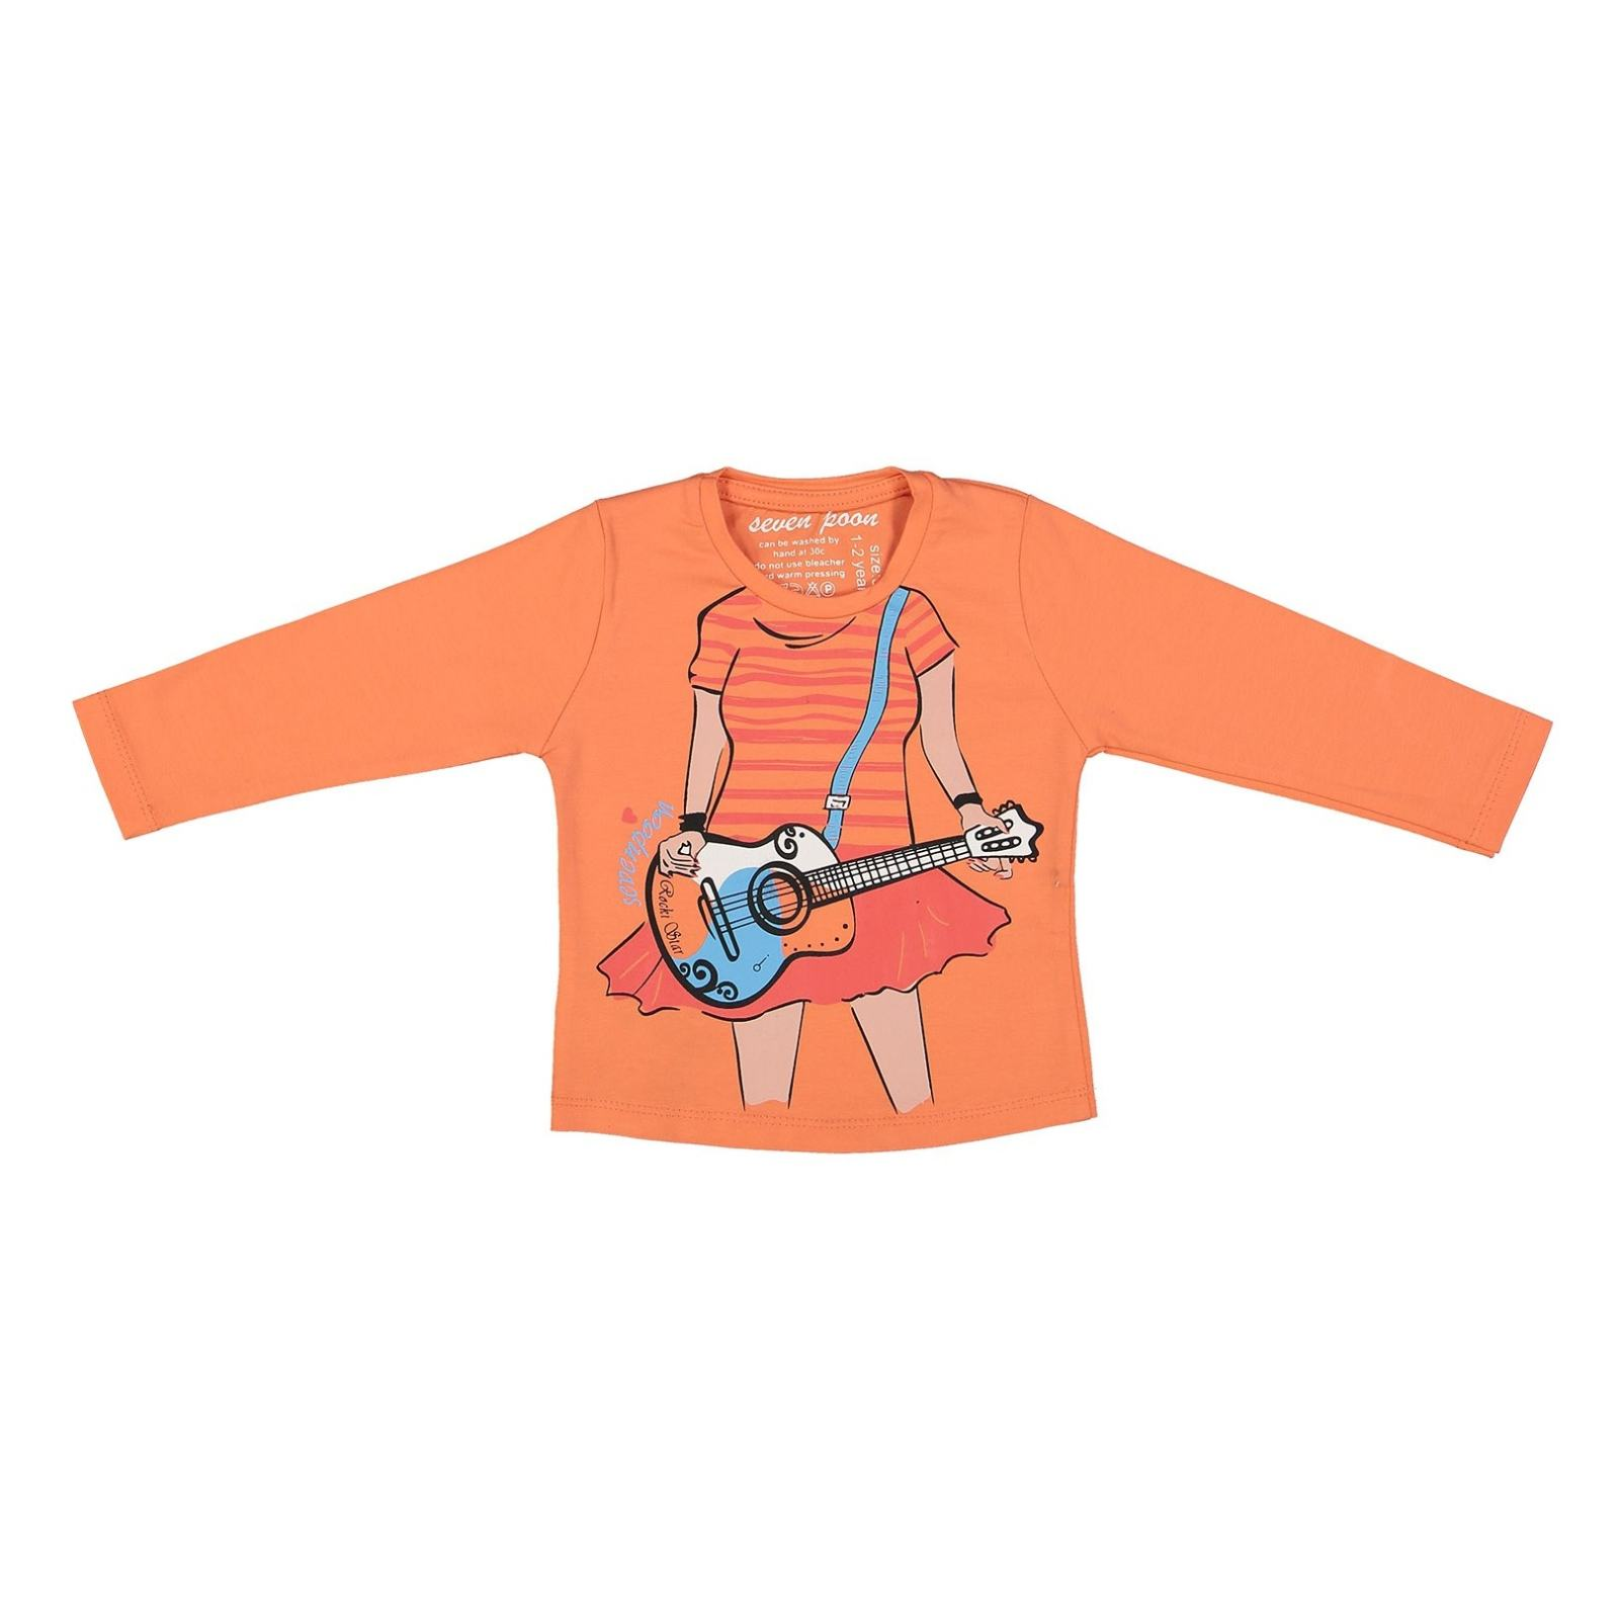 تی شرت نخی یقه گرد دخترانه - سون پون - نارنجی - 1